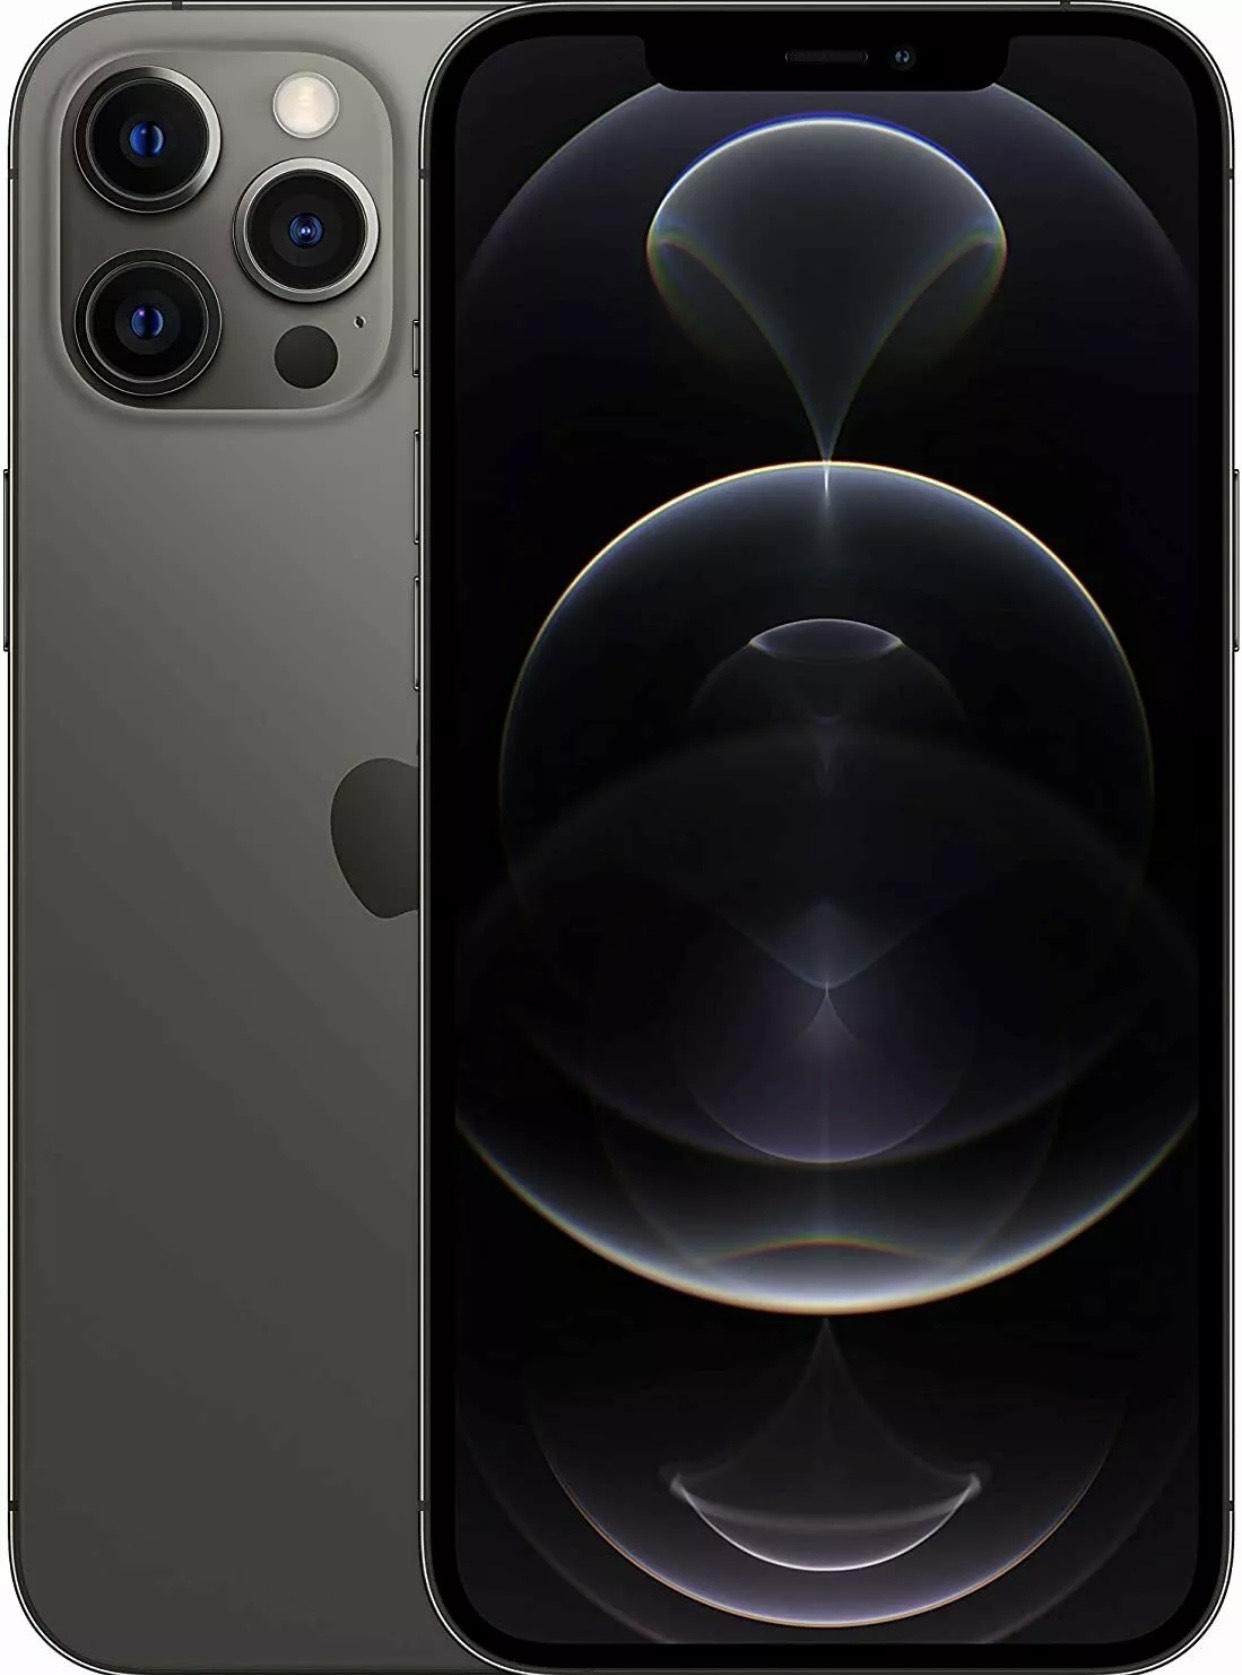 Apple iPhone 12 Pro Max 128GB Graphite Grau 6,7 Zoll Smartphone Händler OVP NEU